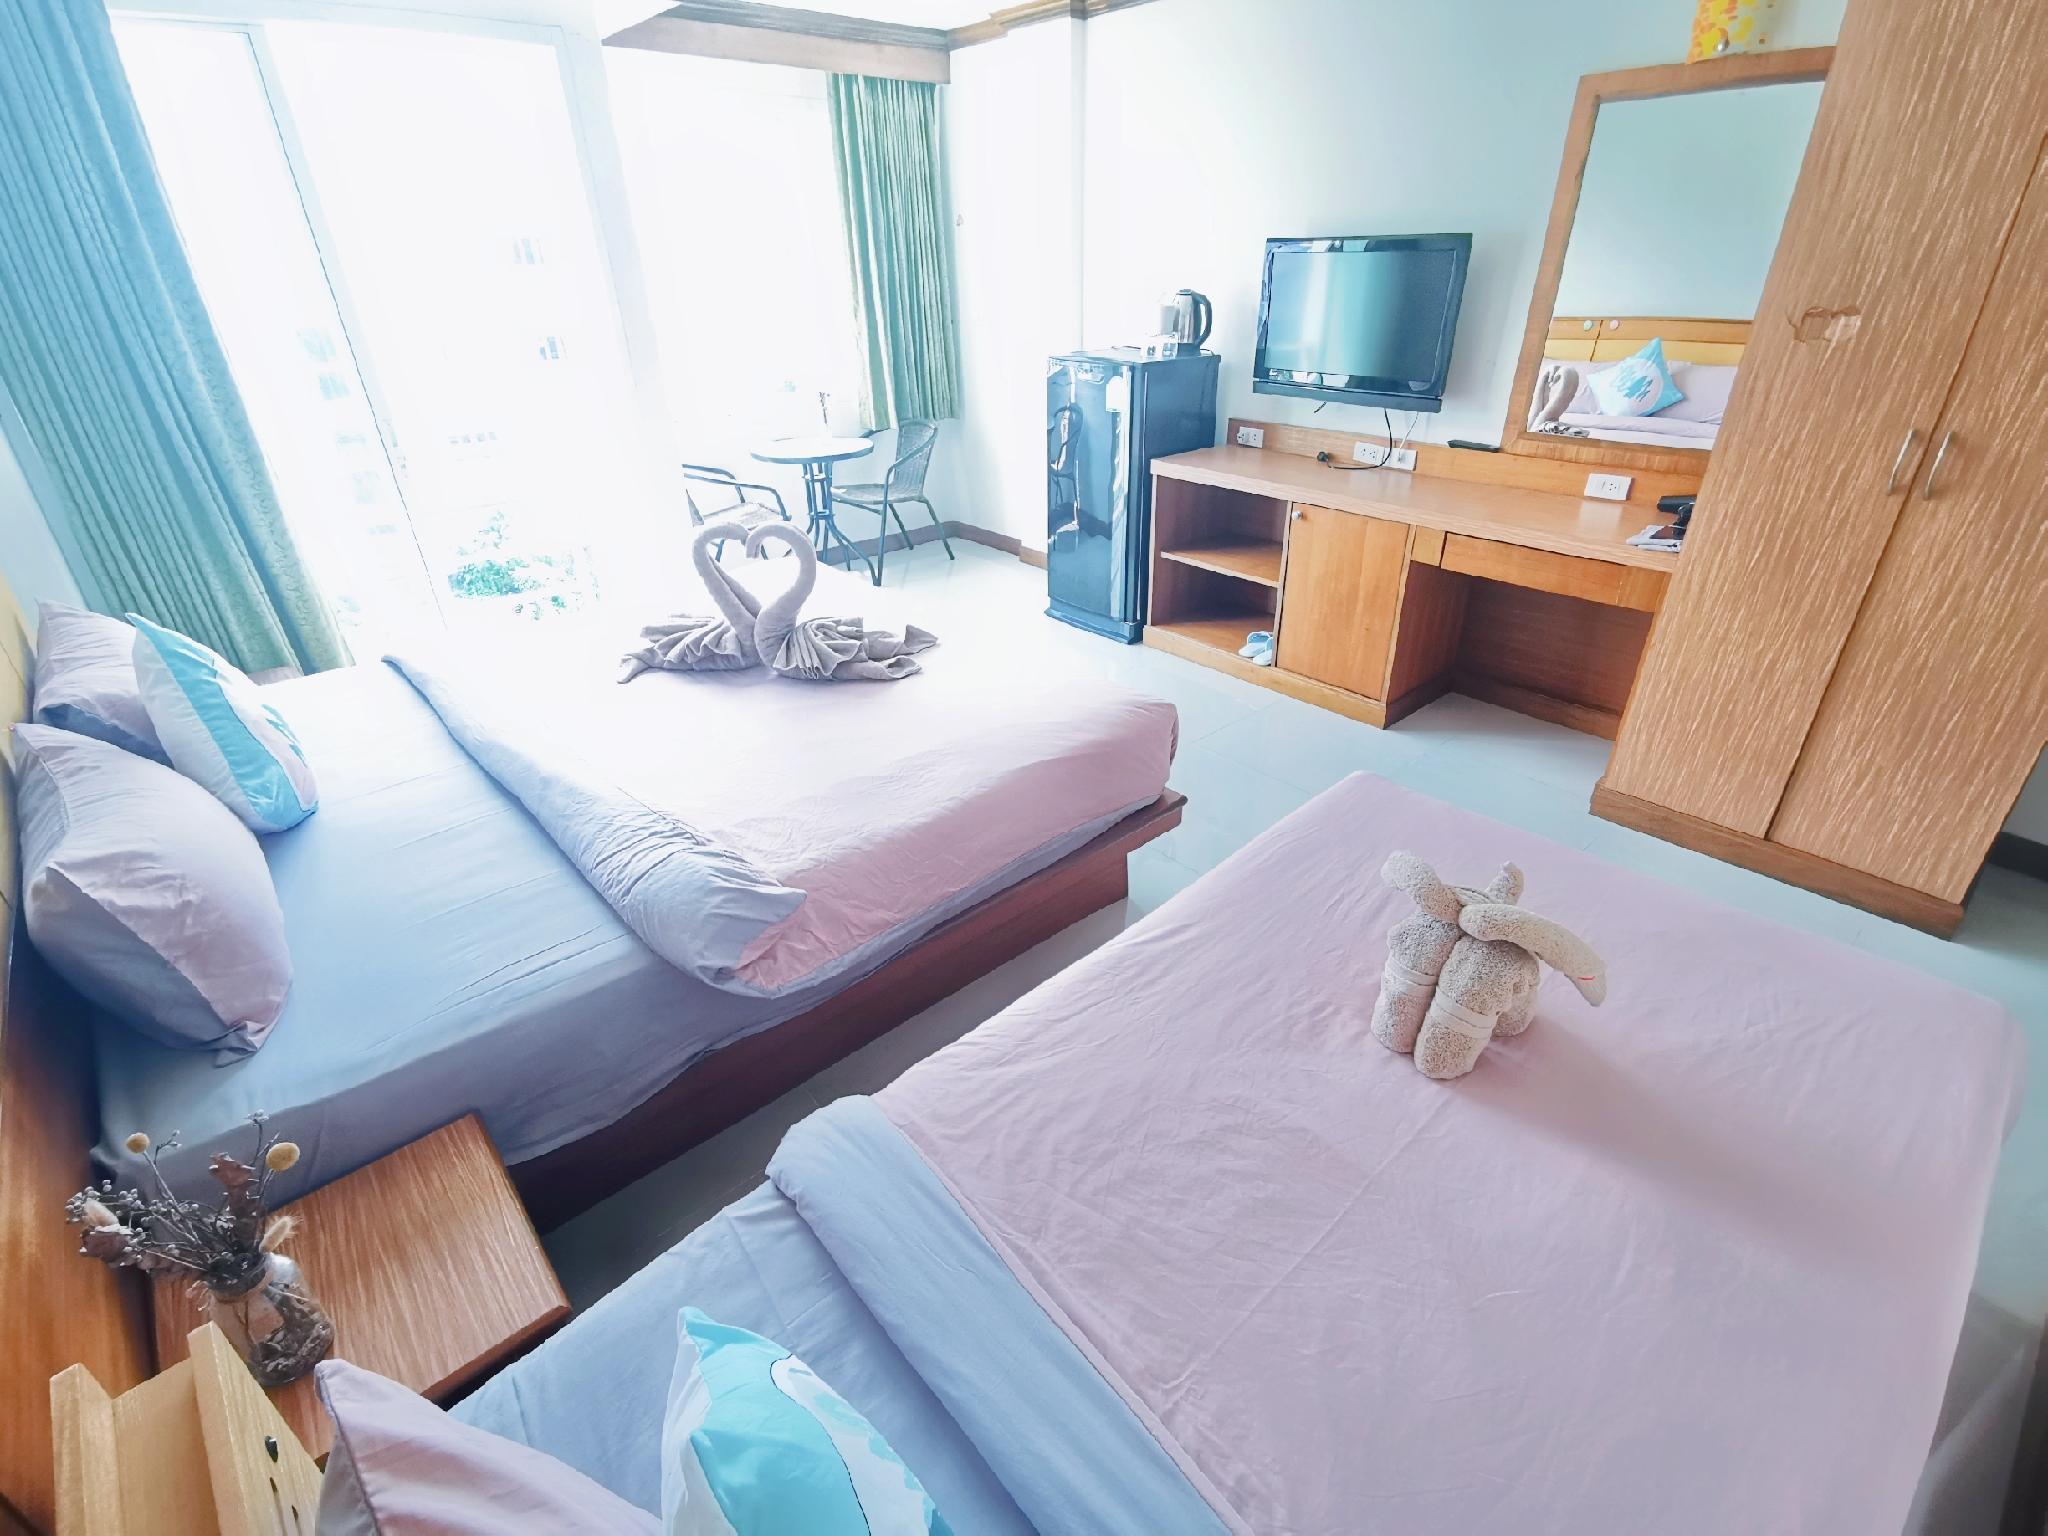 Patong Boutique 3 people Room 3 / Quiet / Clean อพาร์ตเมนต์ 1 ห้องนอน 1 ห้องน้ำส่วนตัว ขนาด 30 ตร.ม. – ป่าตอง